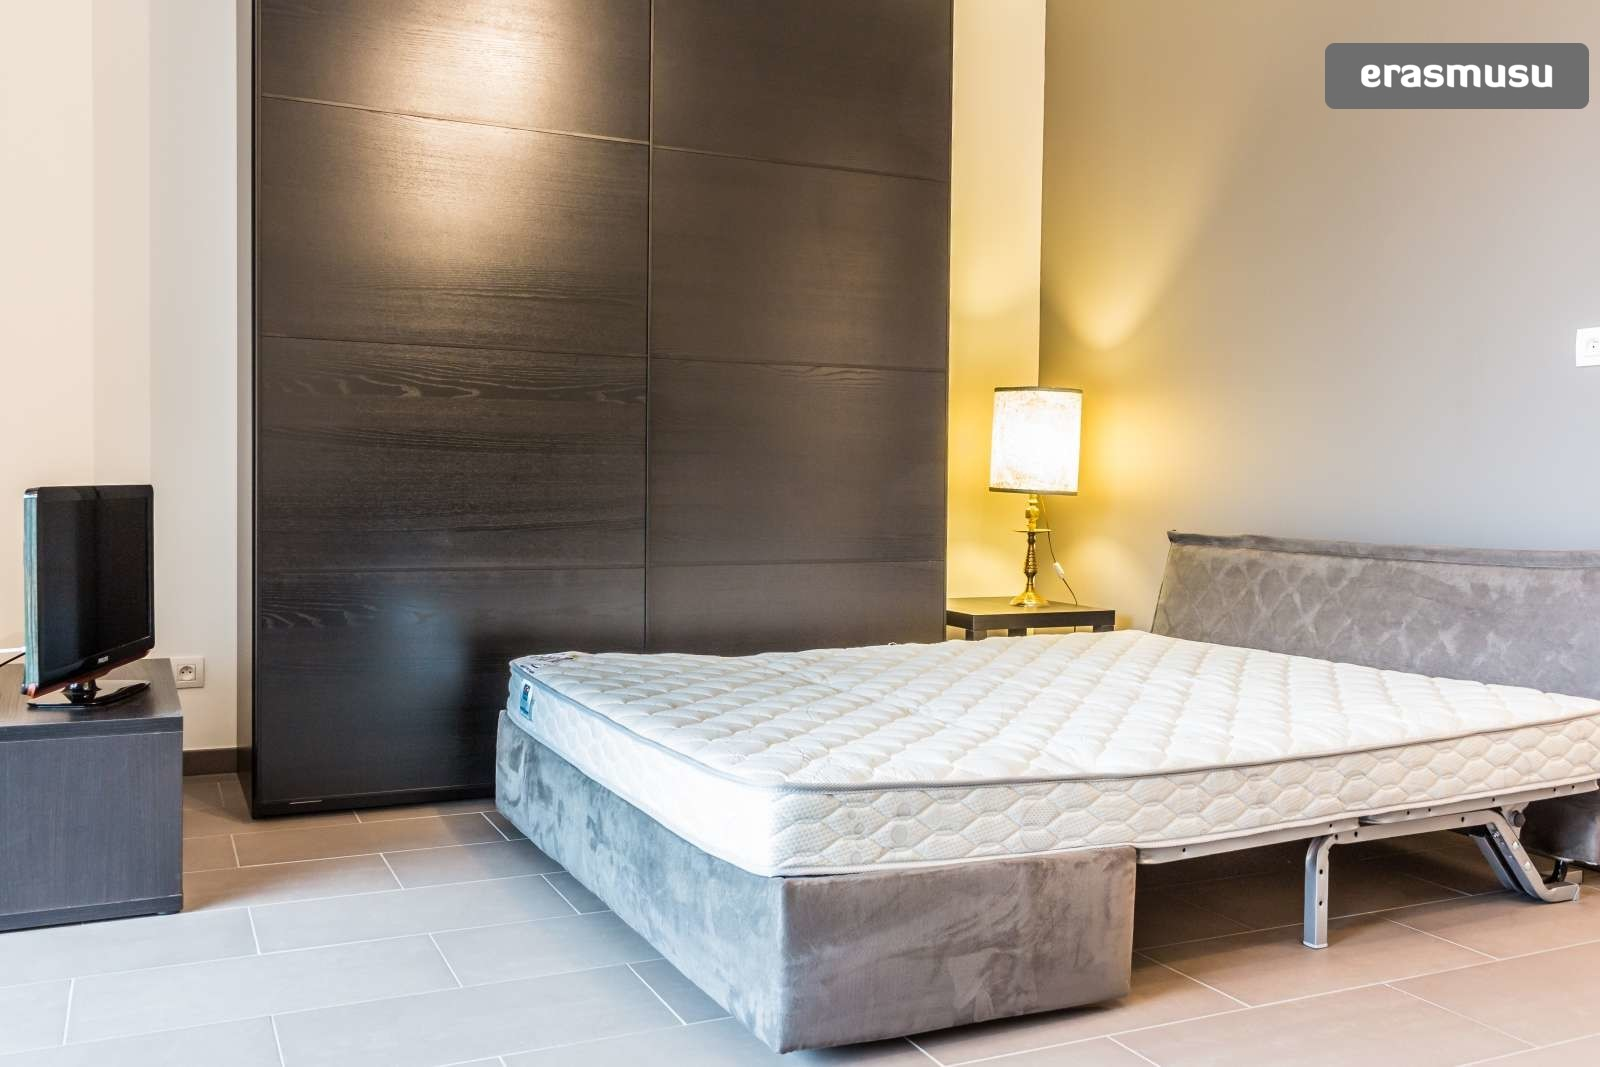 stylish-secure-studio-terrace-fourviere-hill-lyon-5136fe2fa62dfb